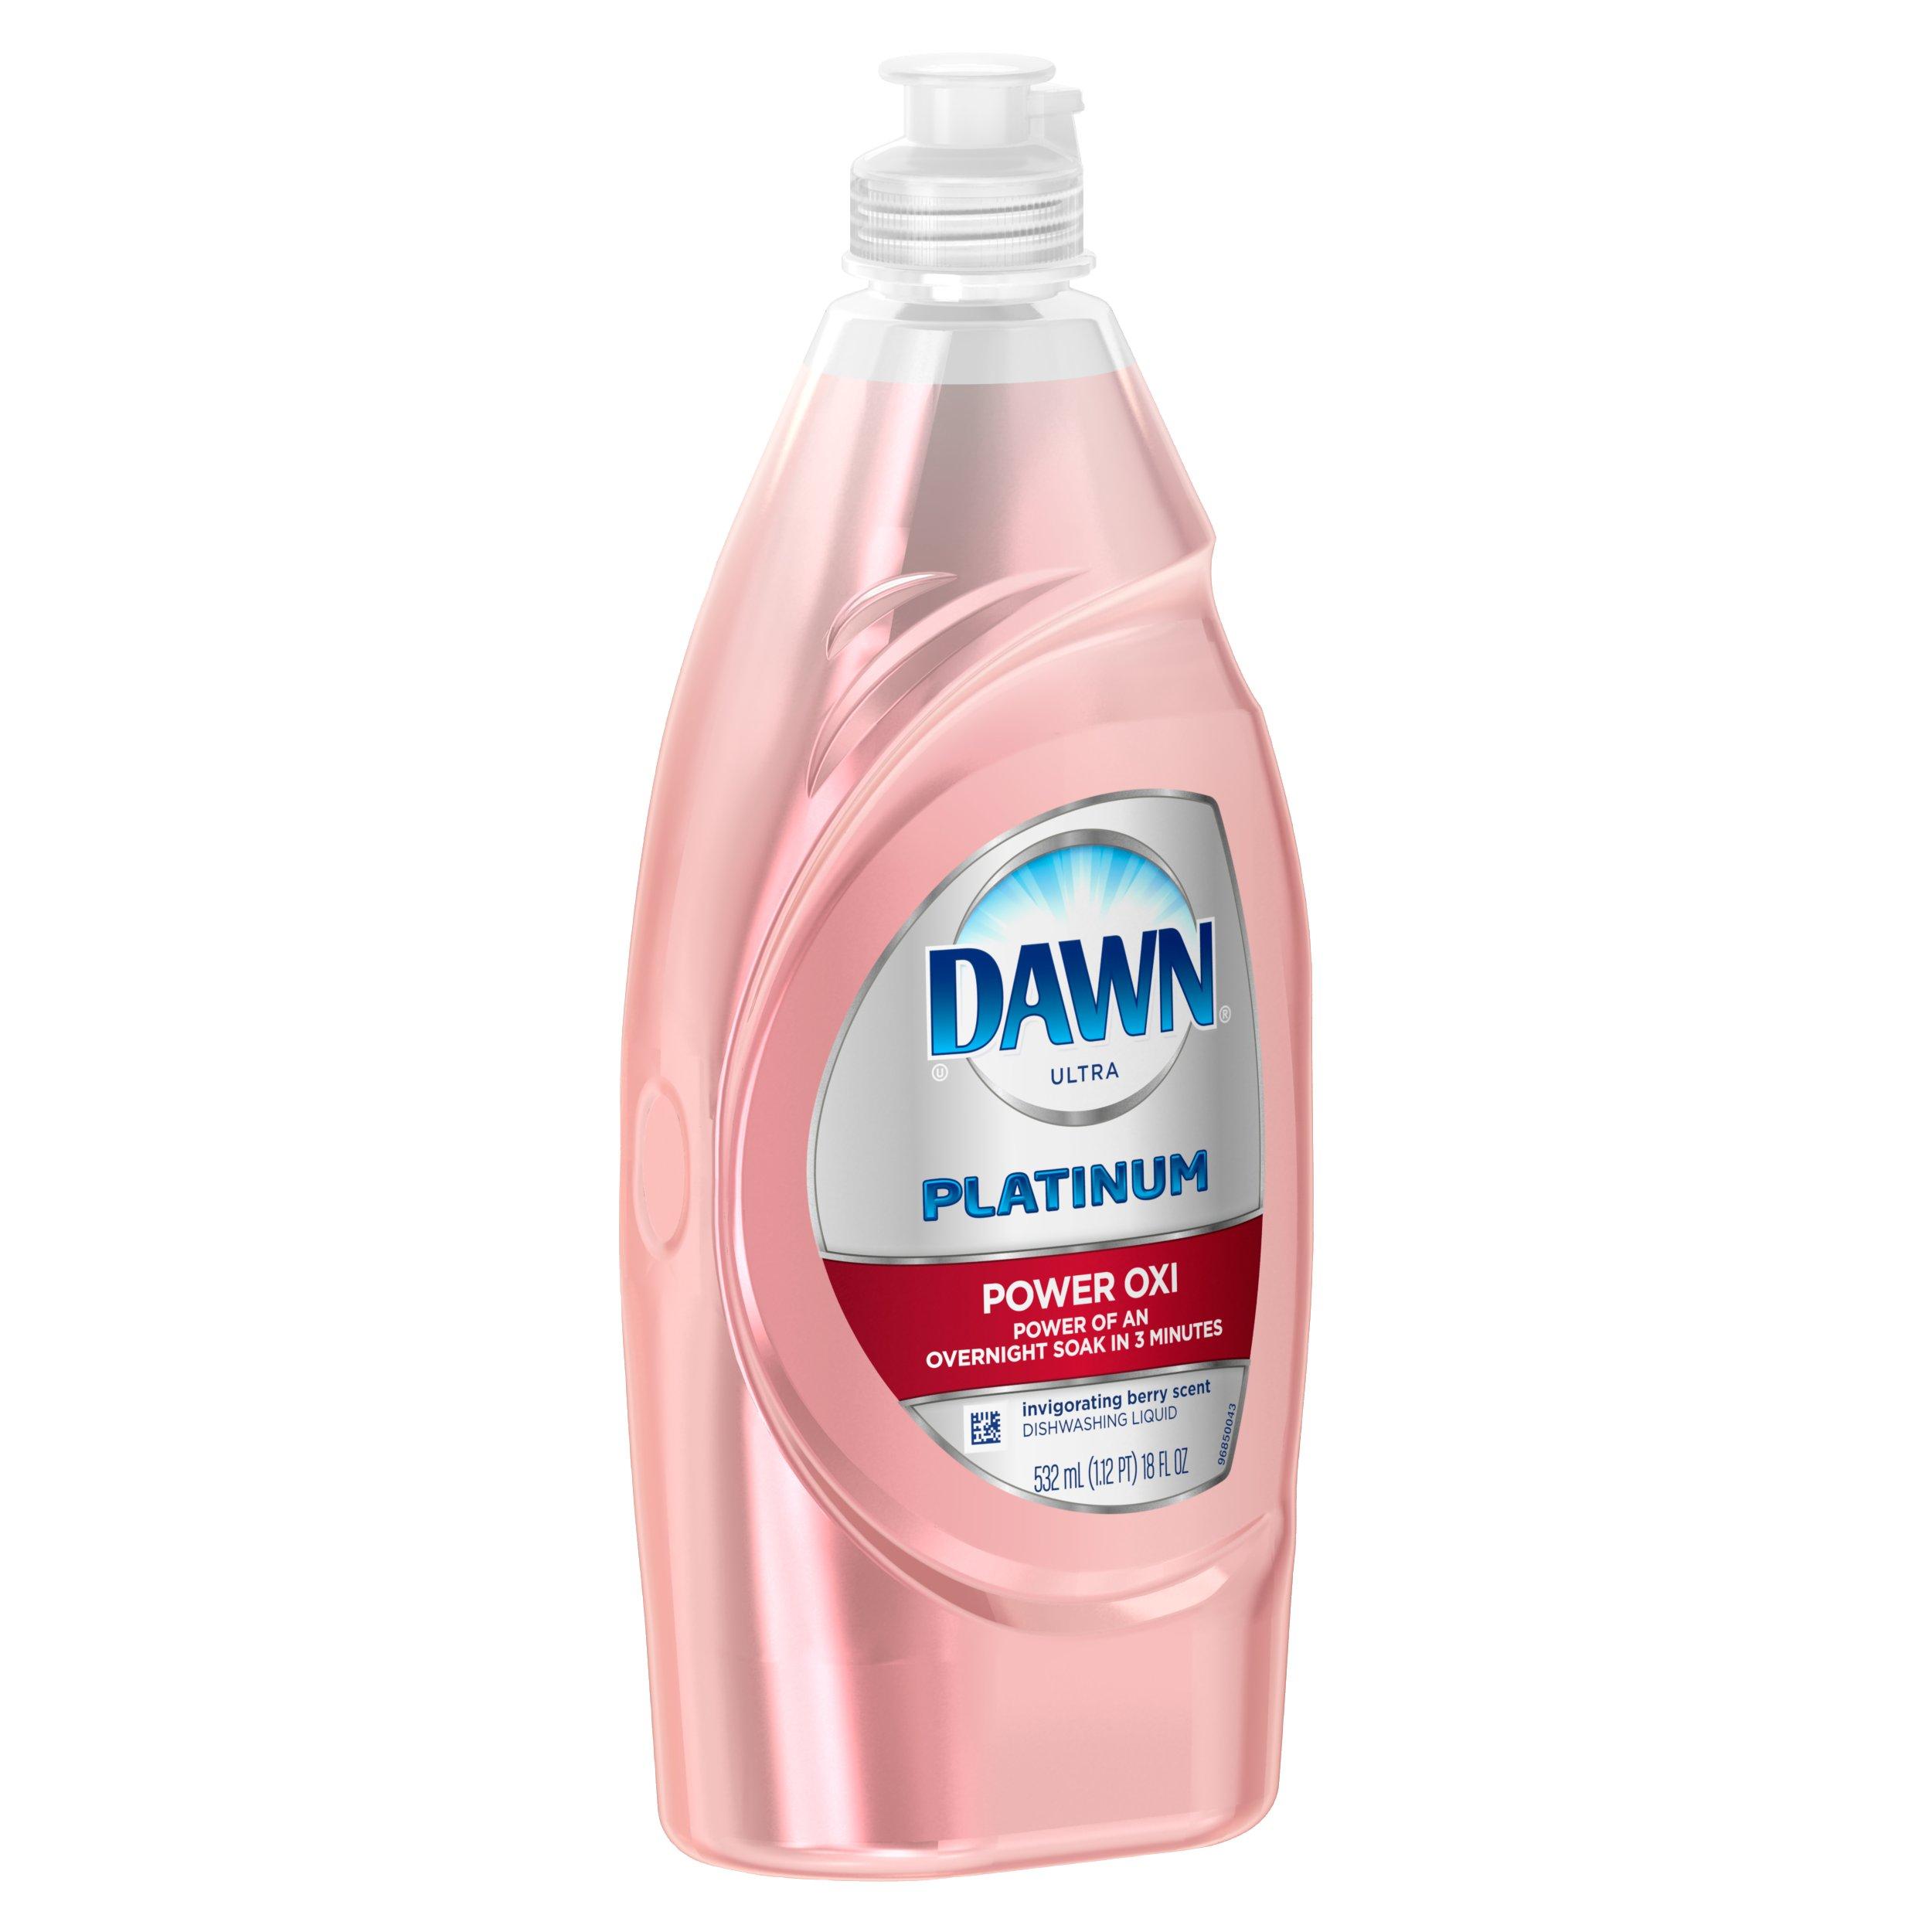 Dawn Platinum Power Oxi Dishwashing Liquid, Invigorating Berry